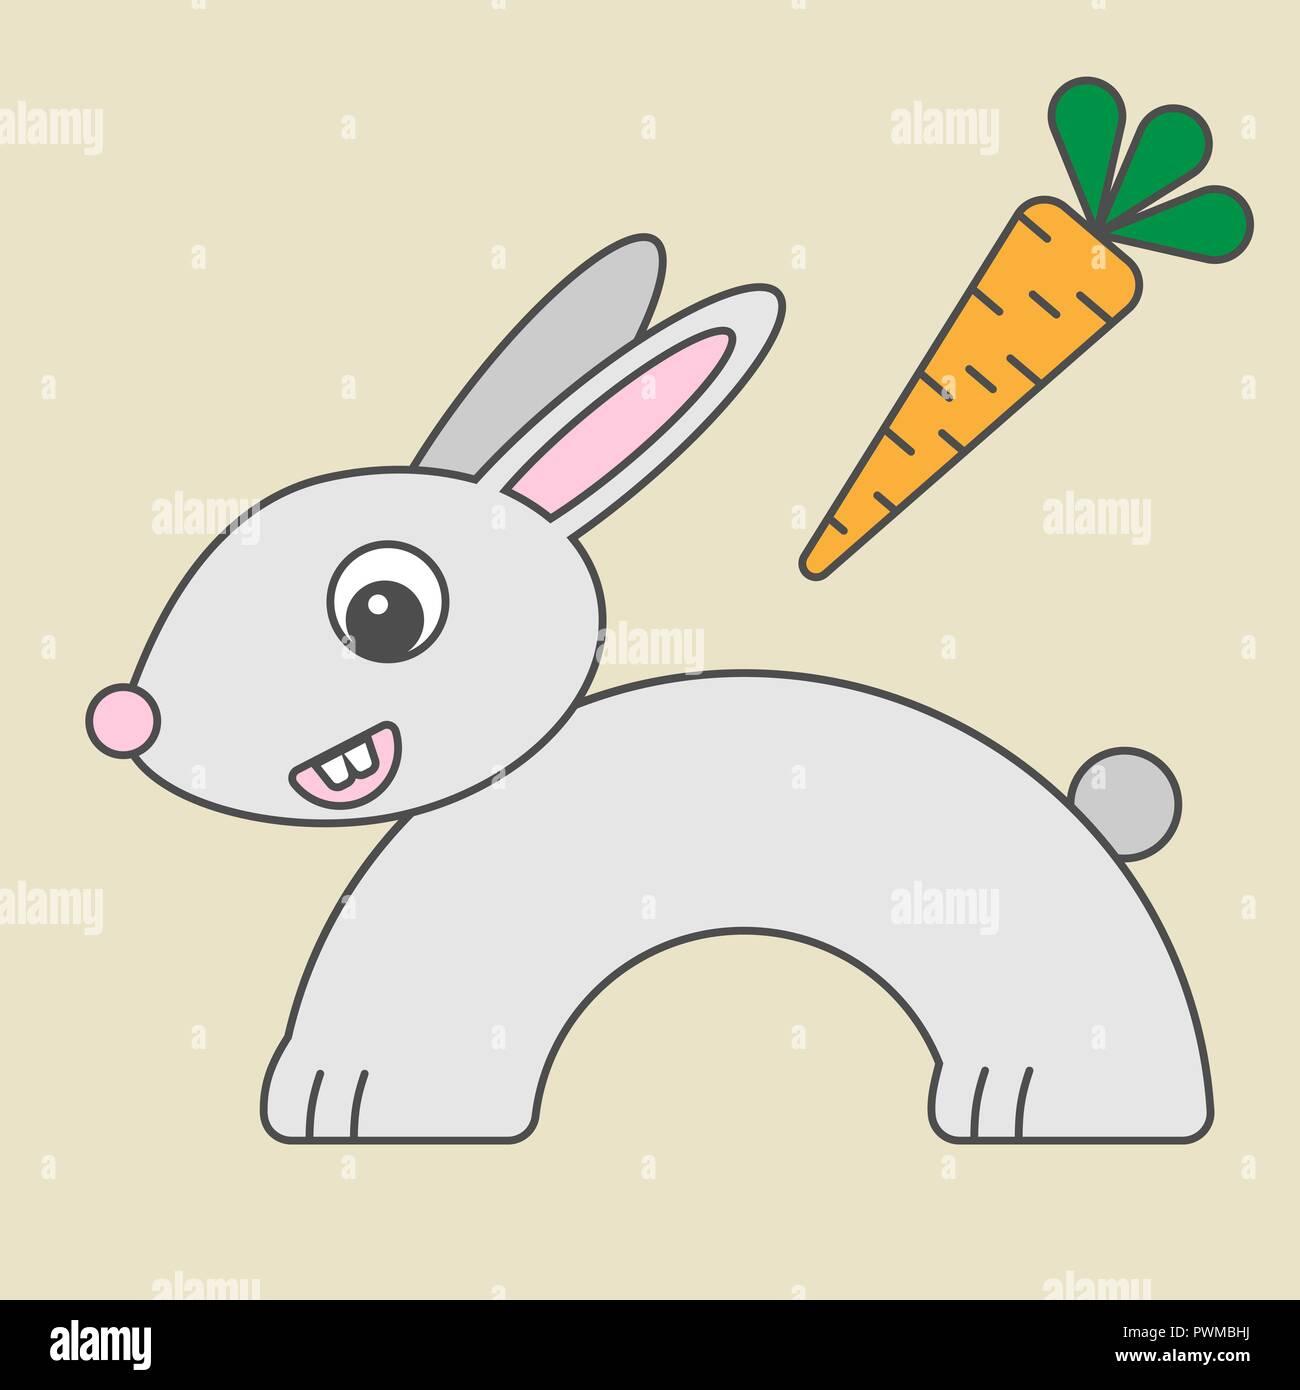 Cartoon Rabbit For Kids Illustration Of Hare For Children Bunny In